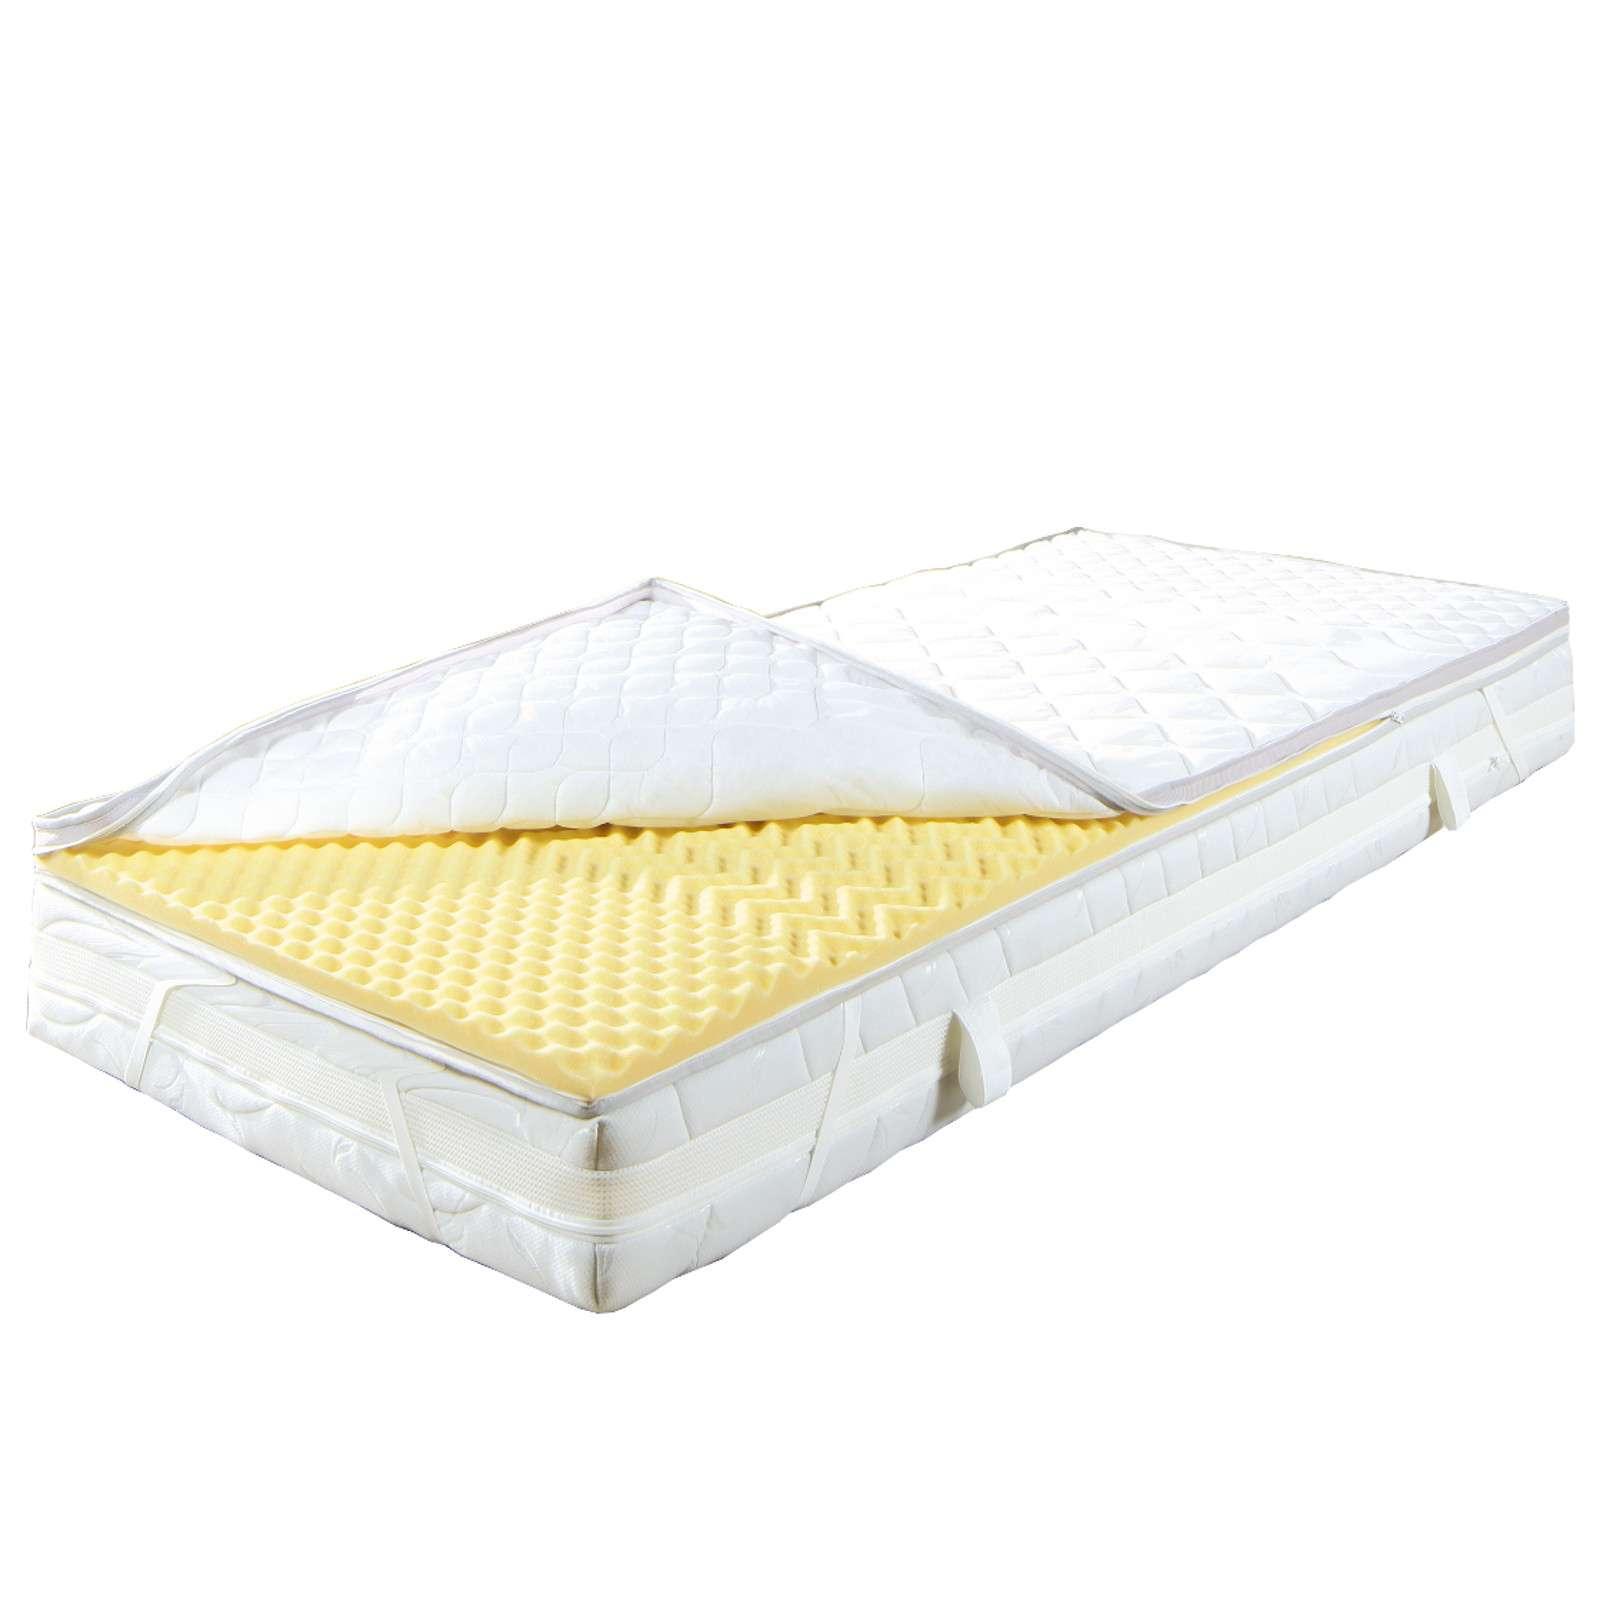 f a n medisan visco soft matratzentopper 160x200 cm. Black Bedroom Furniture Sets. Home Design Ideas